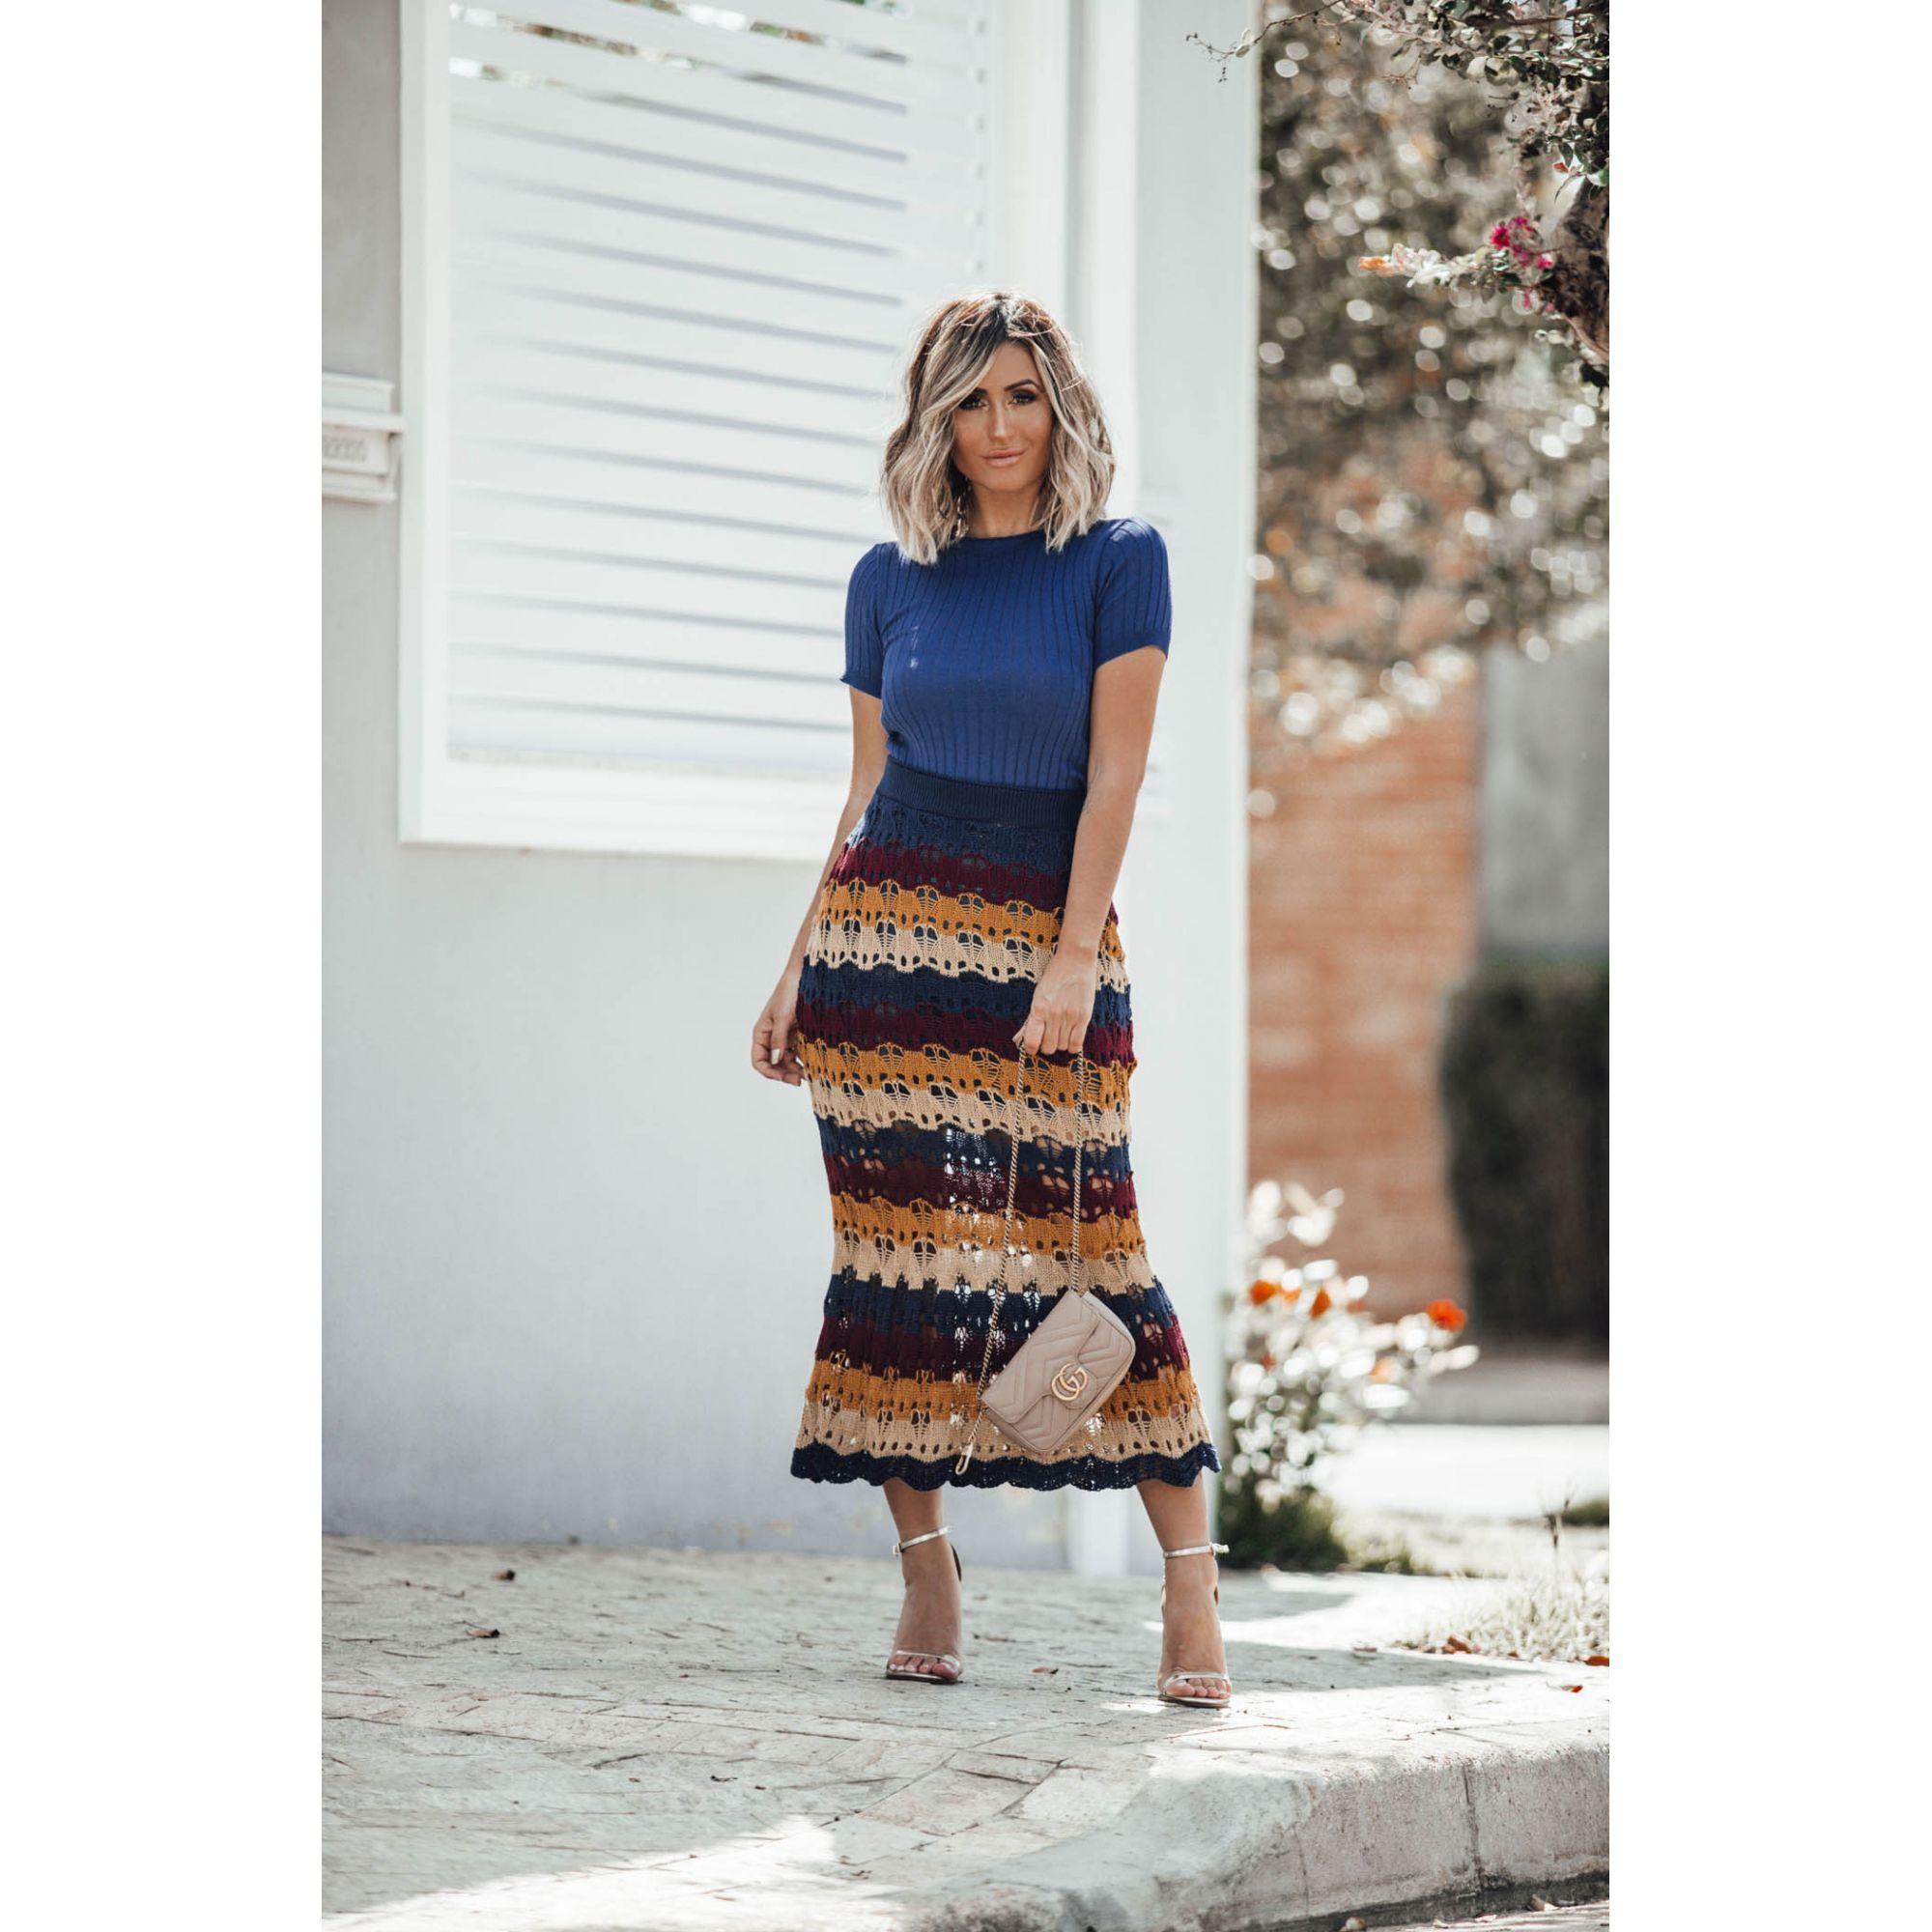 Tricô Saia Vera Tricot Renda Colorida Cordão Feminino